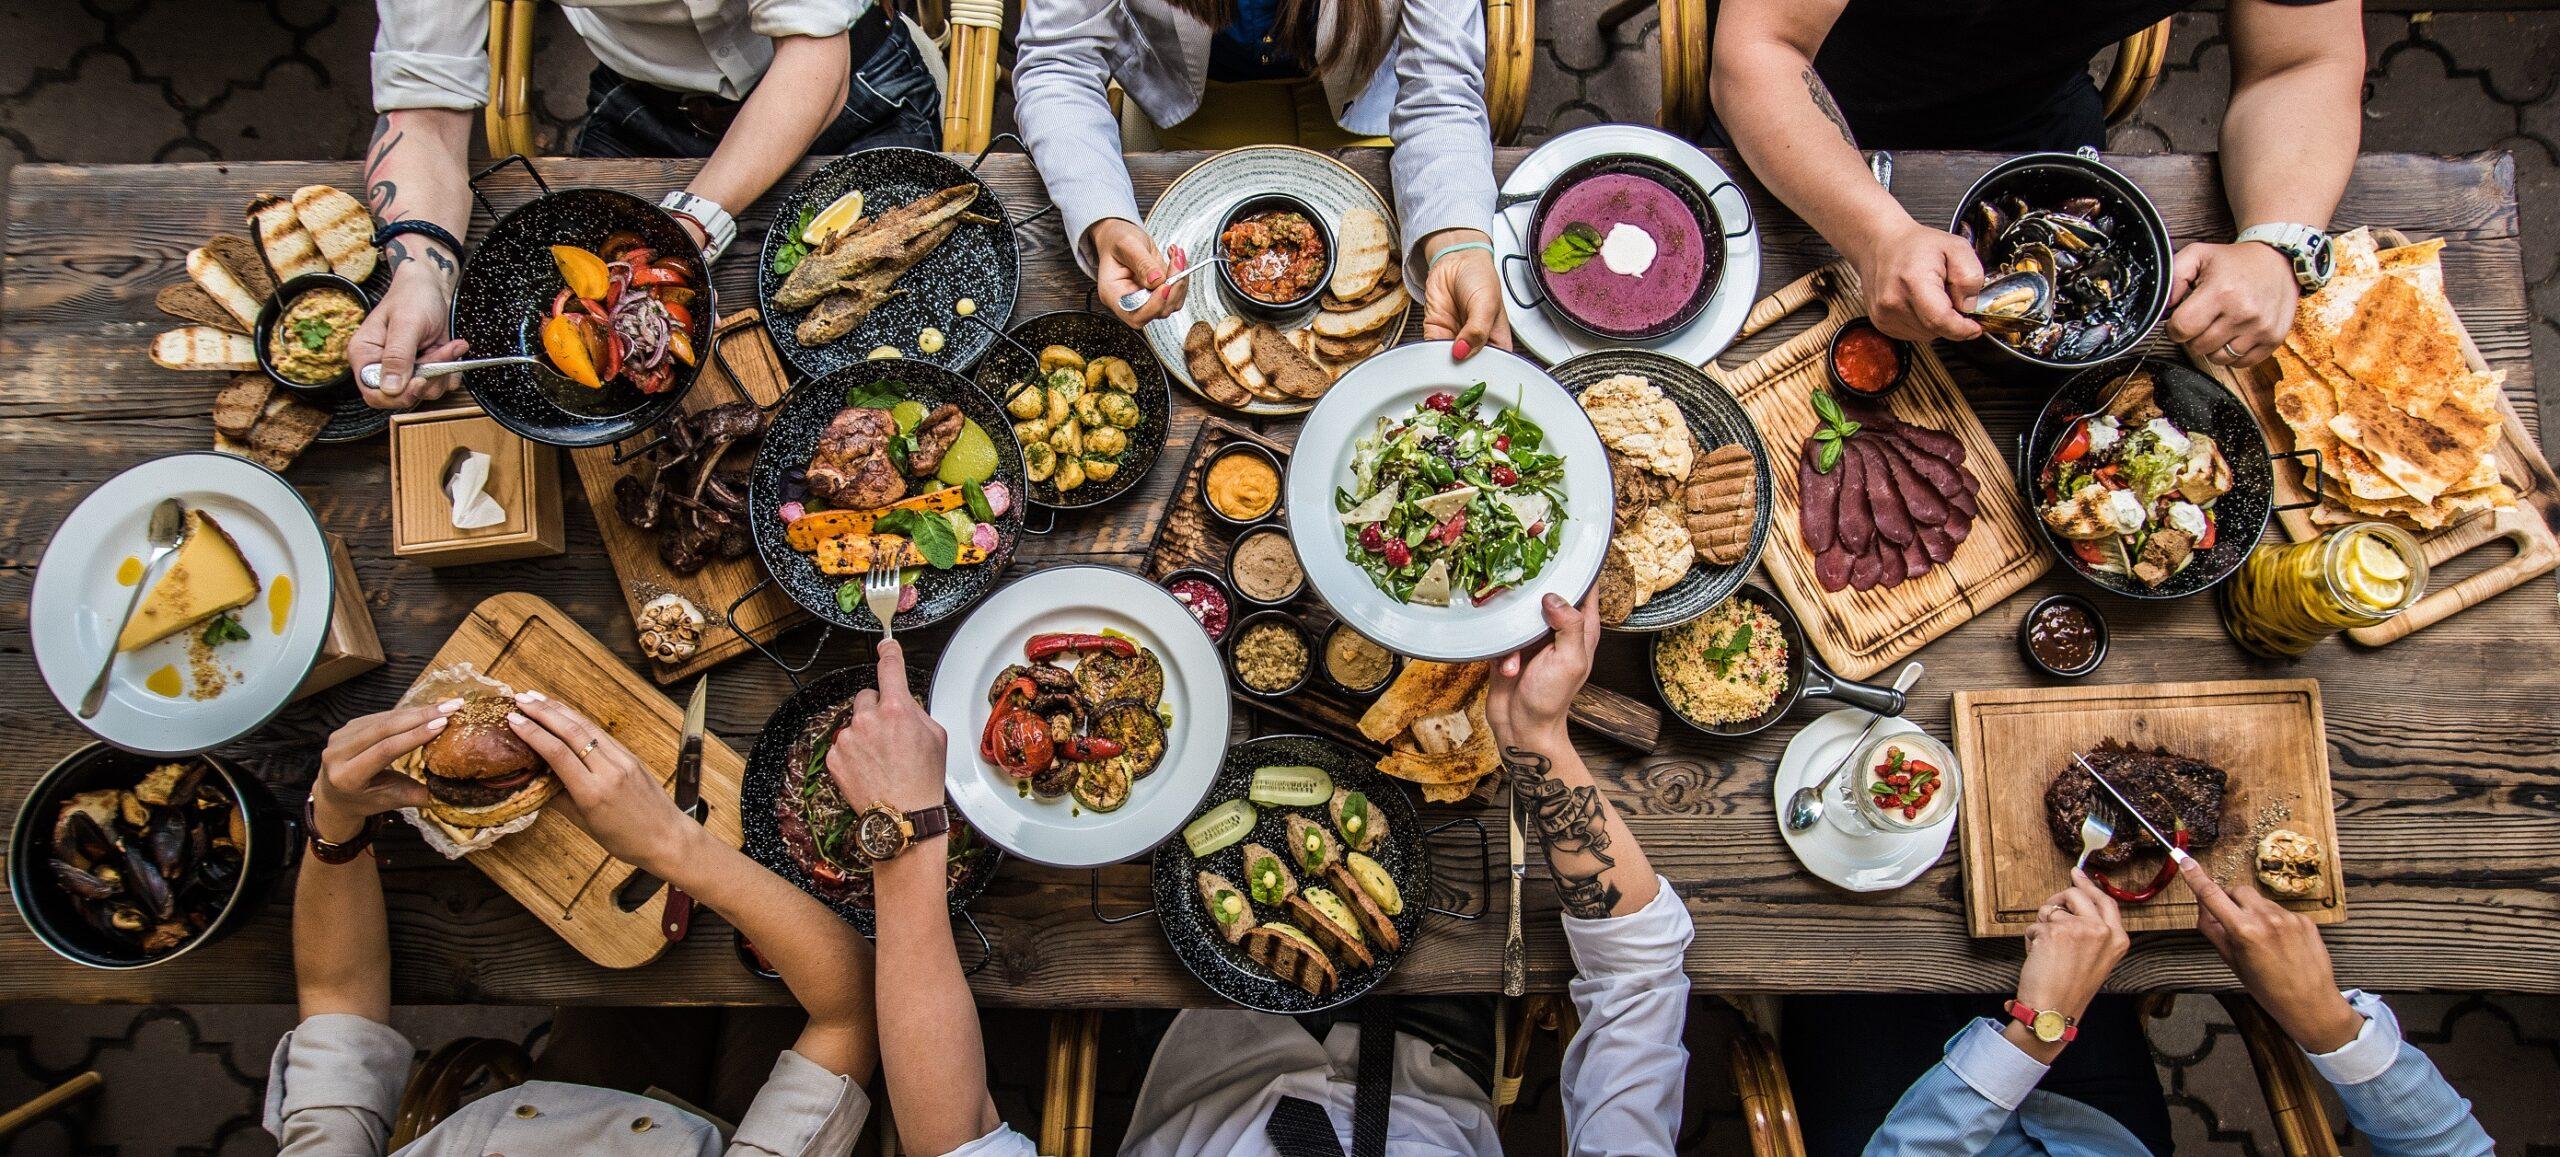 The Universal Language of Food